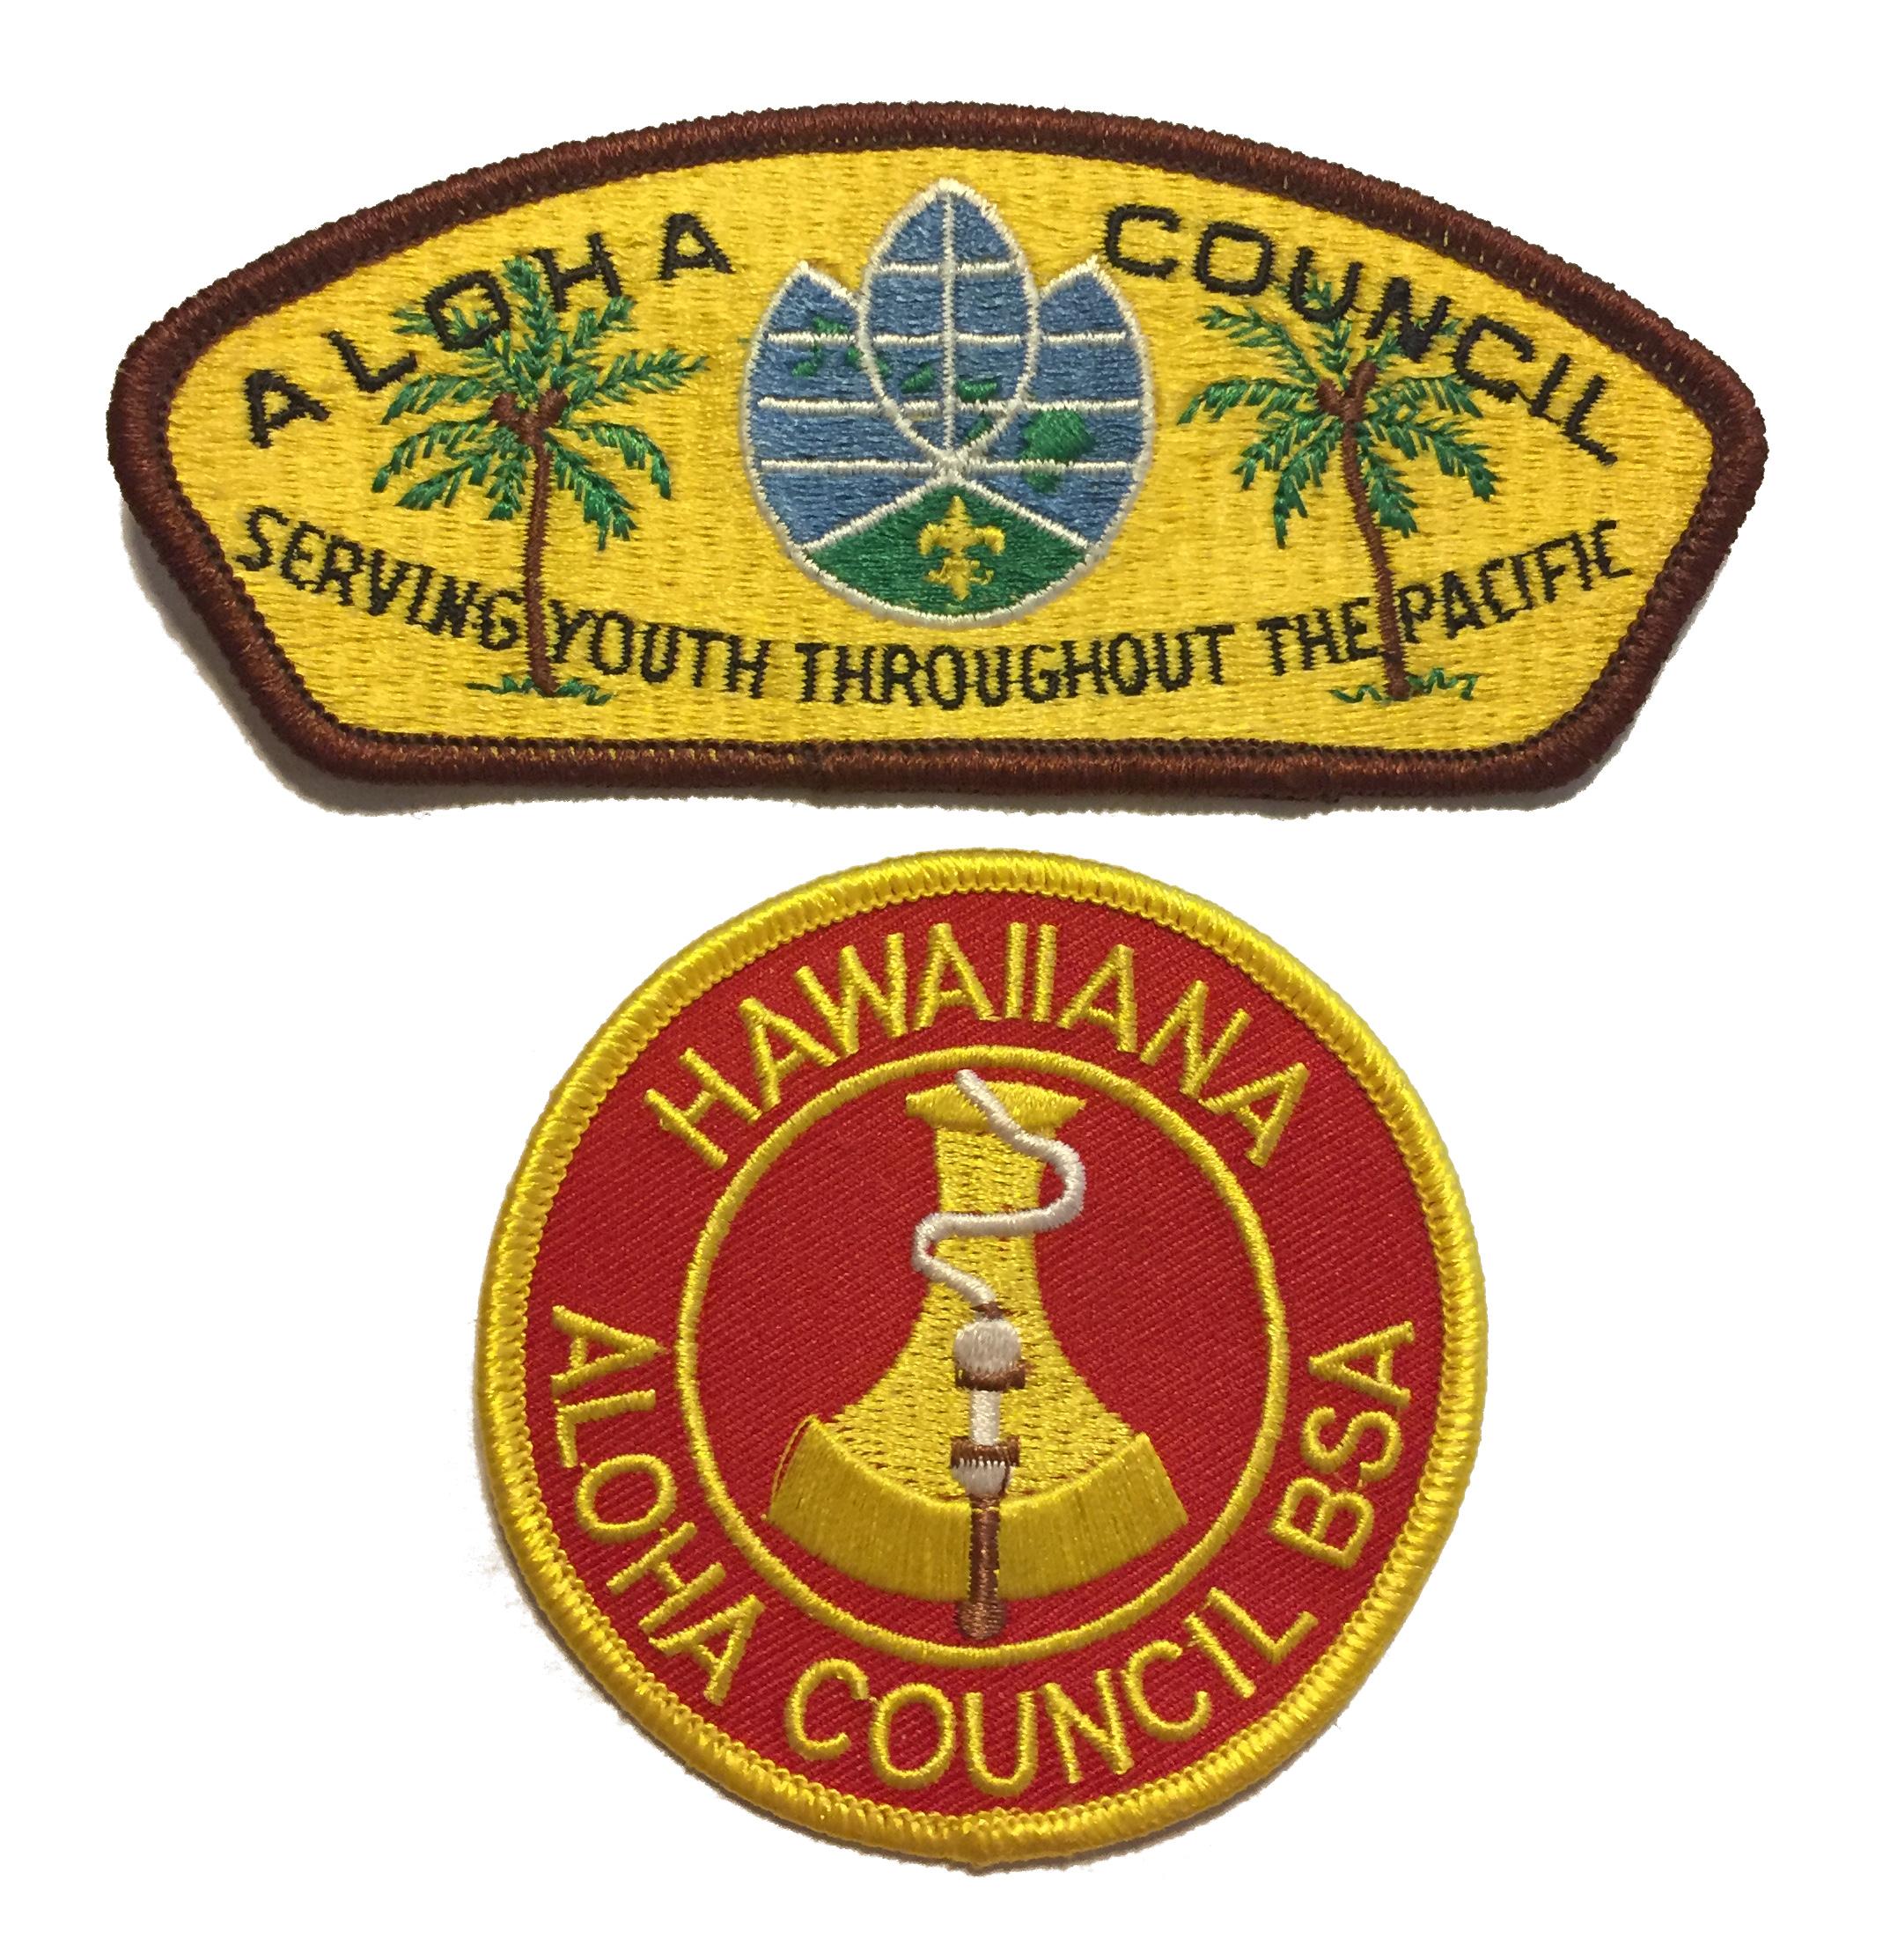 Aloha Council